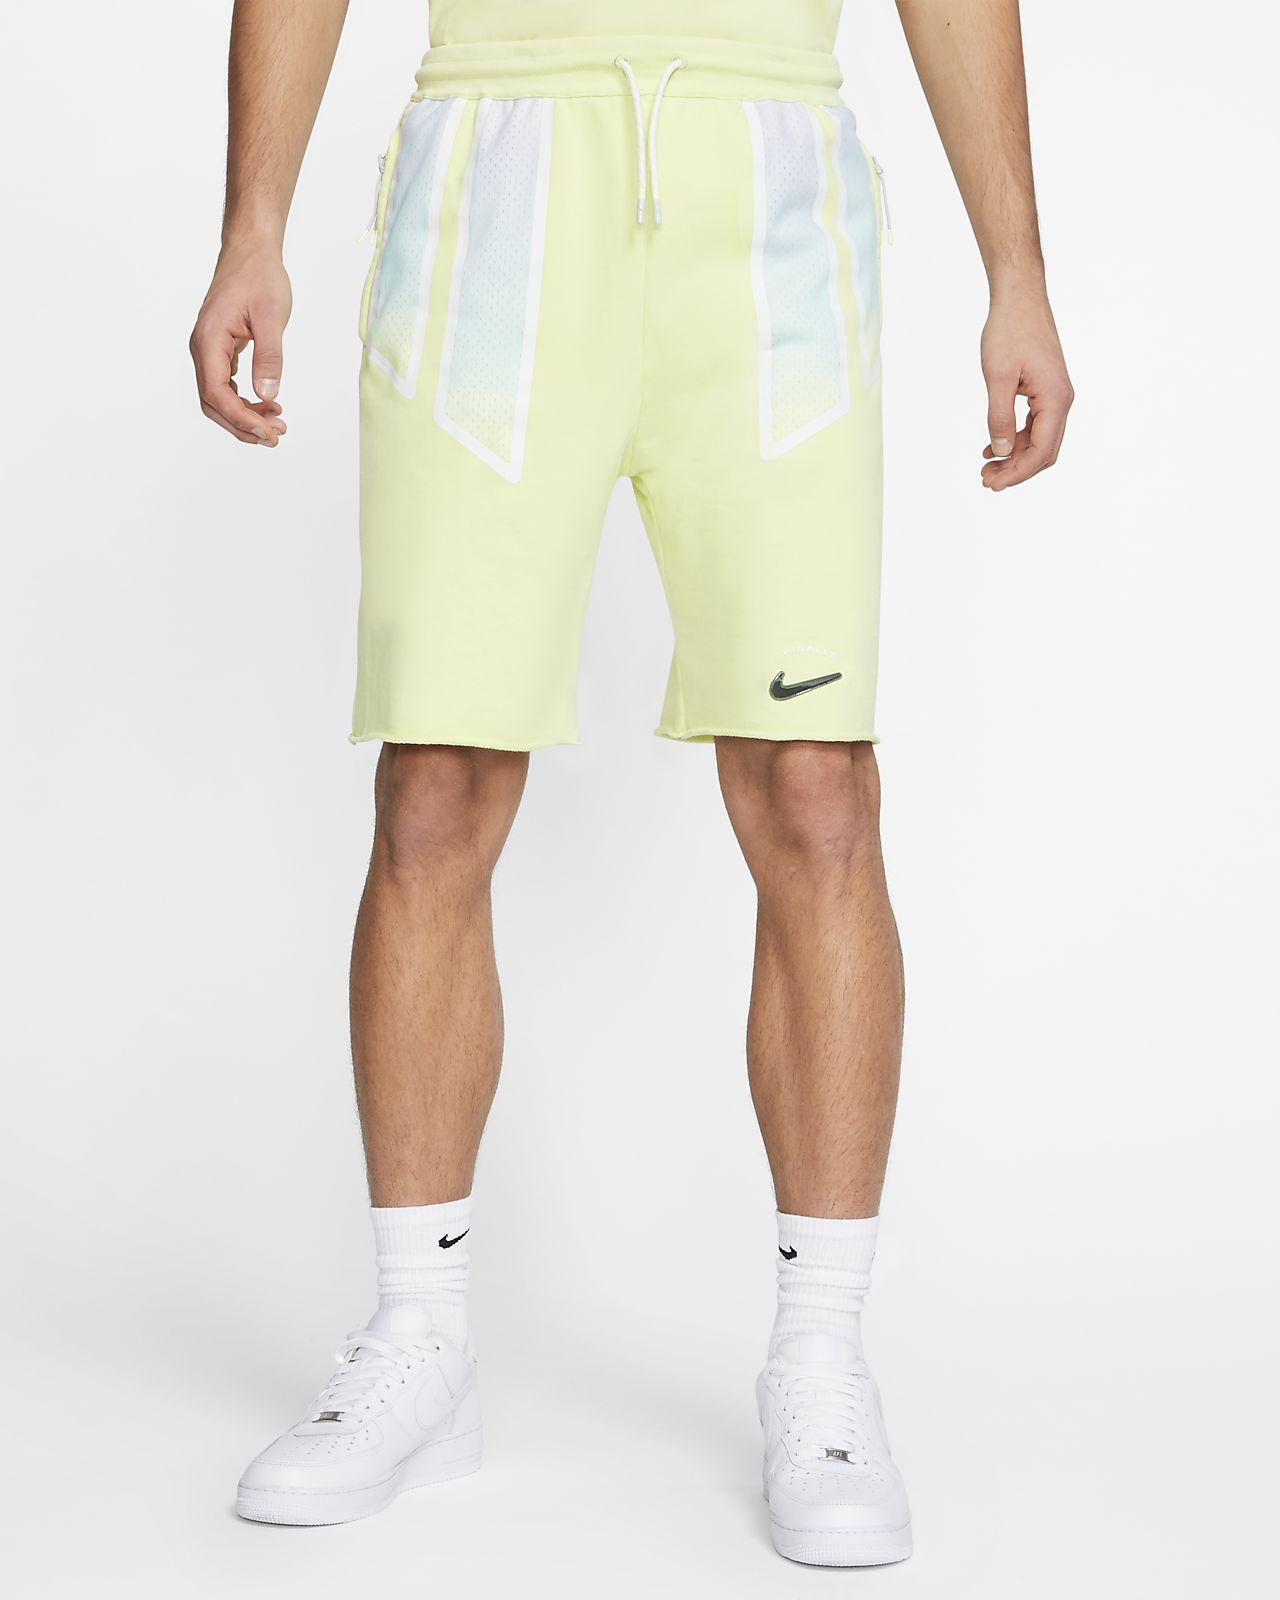 Nike x Pigalle 男款 Fleece 短褲